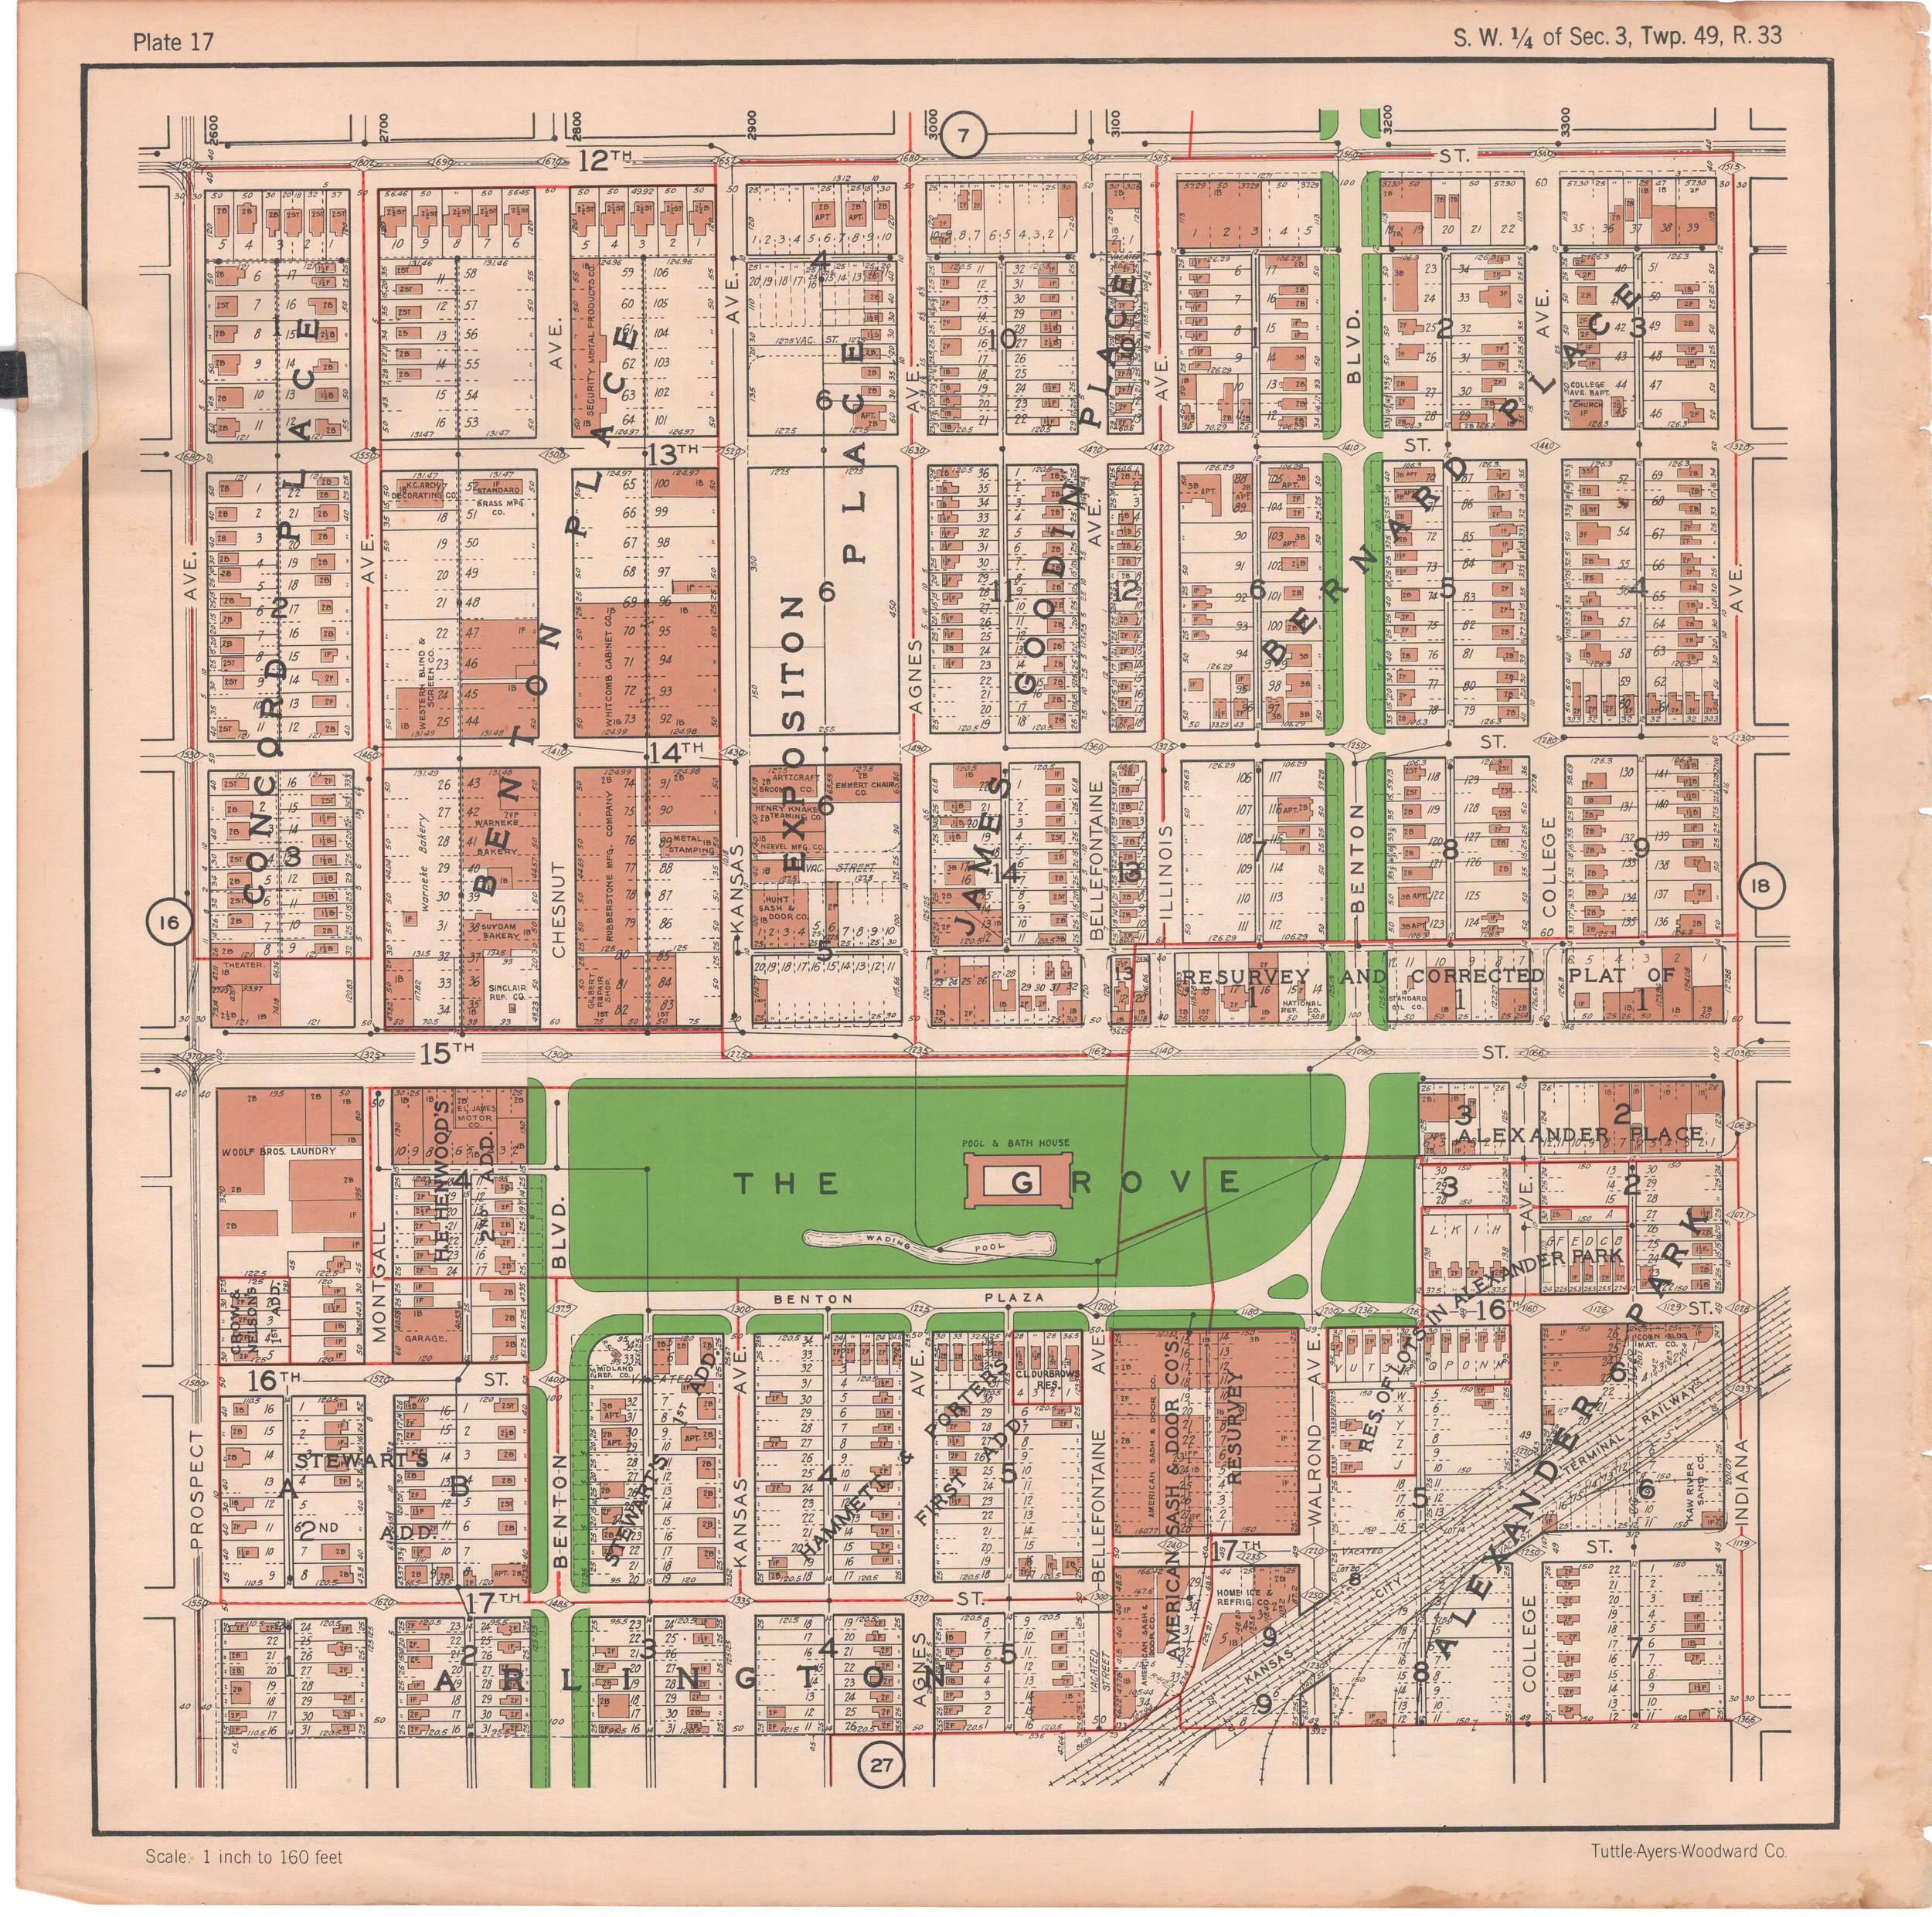 1925 TUTTLE_AYERS_Plate 17.JPG